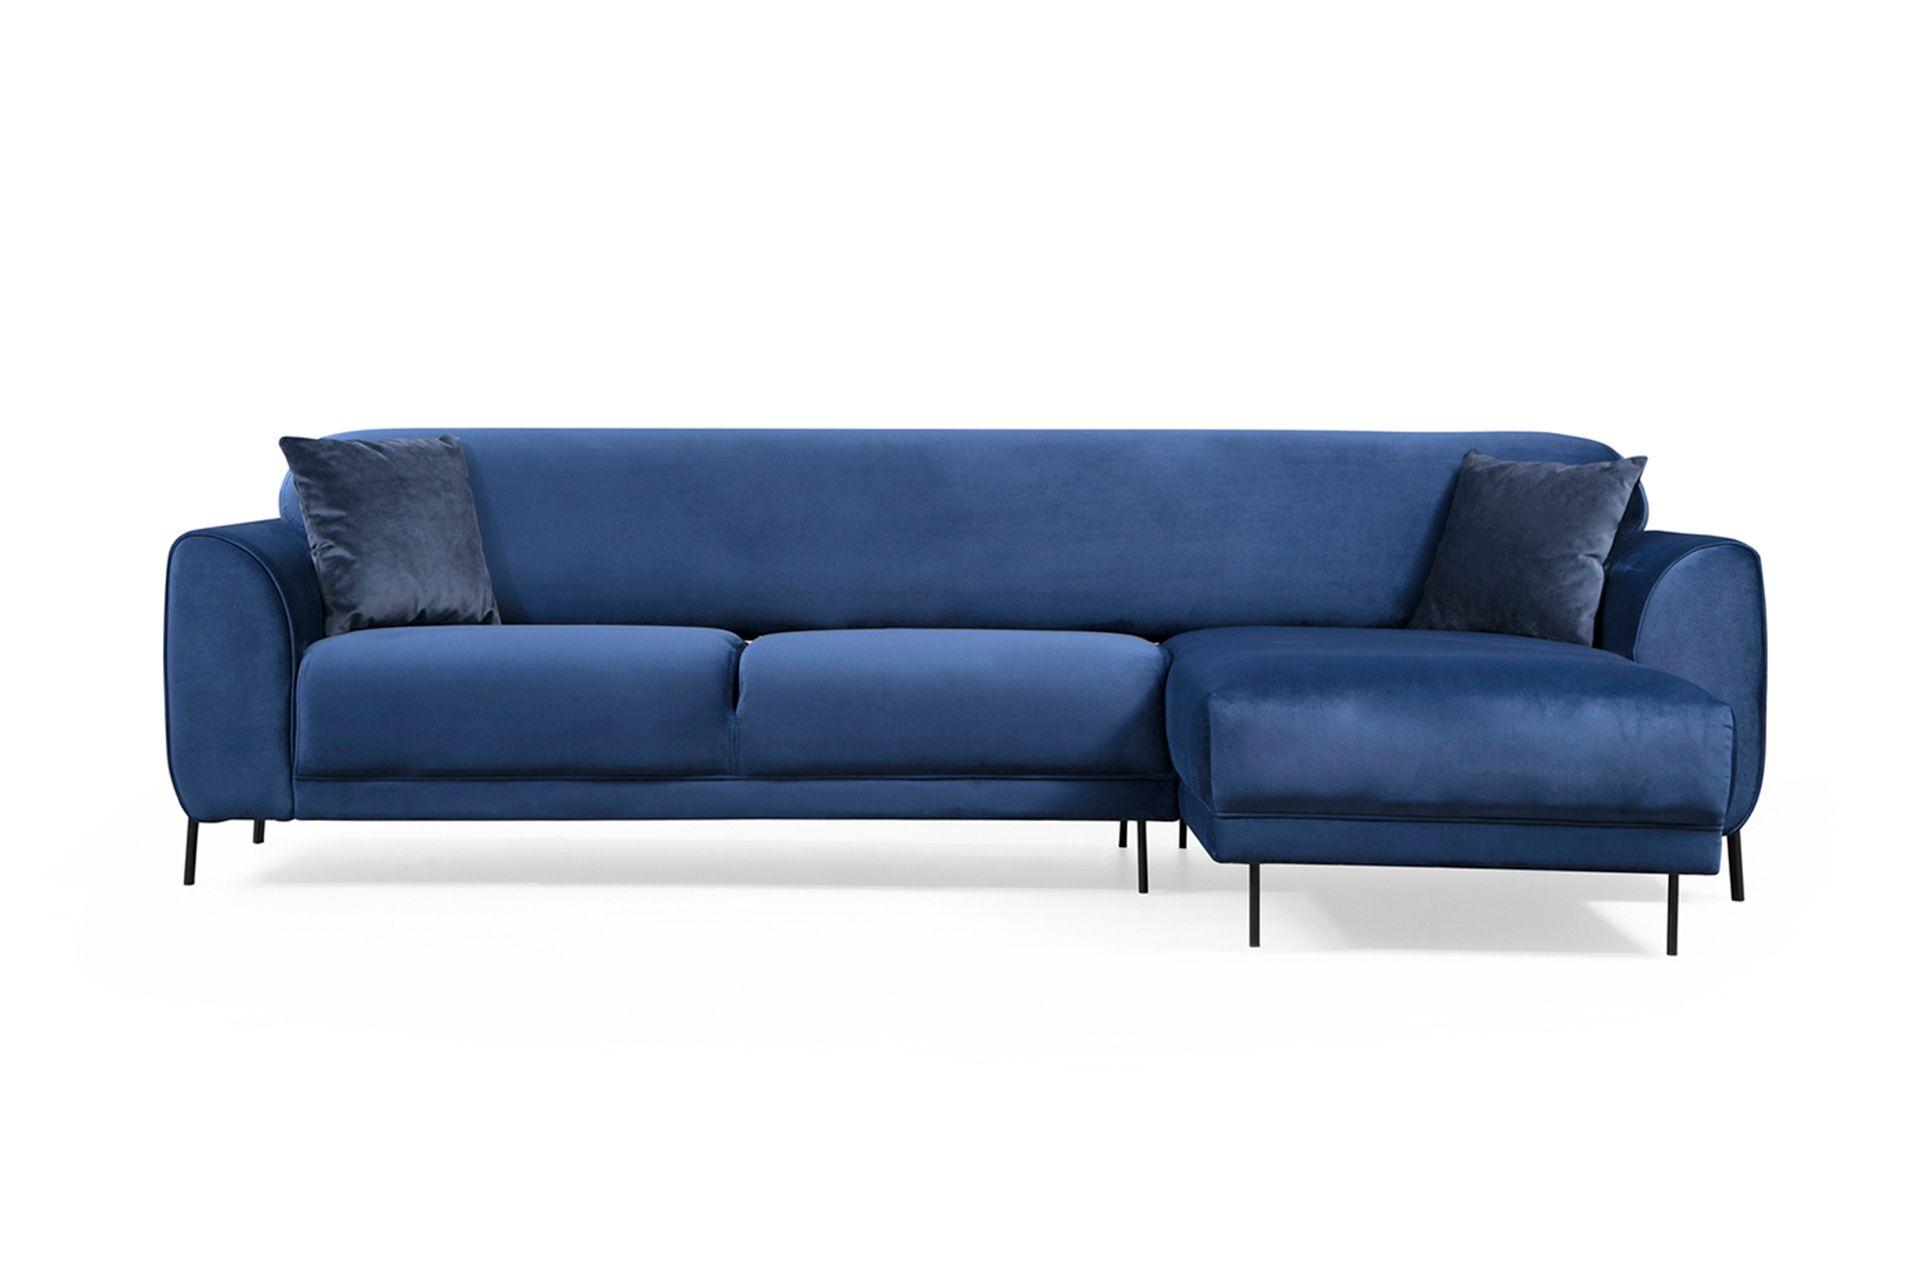 Cloud Corner Sofa Bed, Blue (Right)